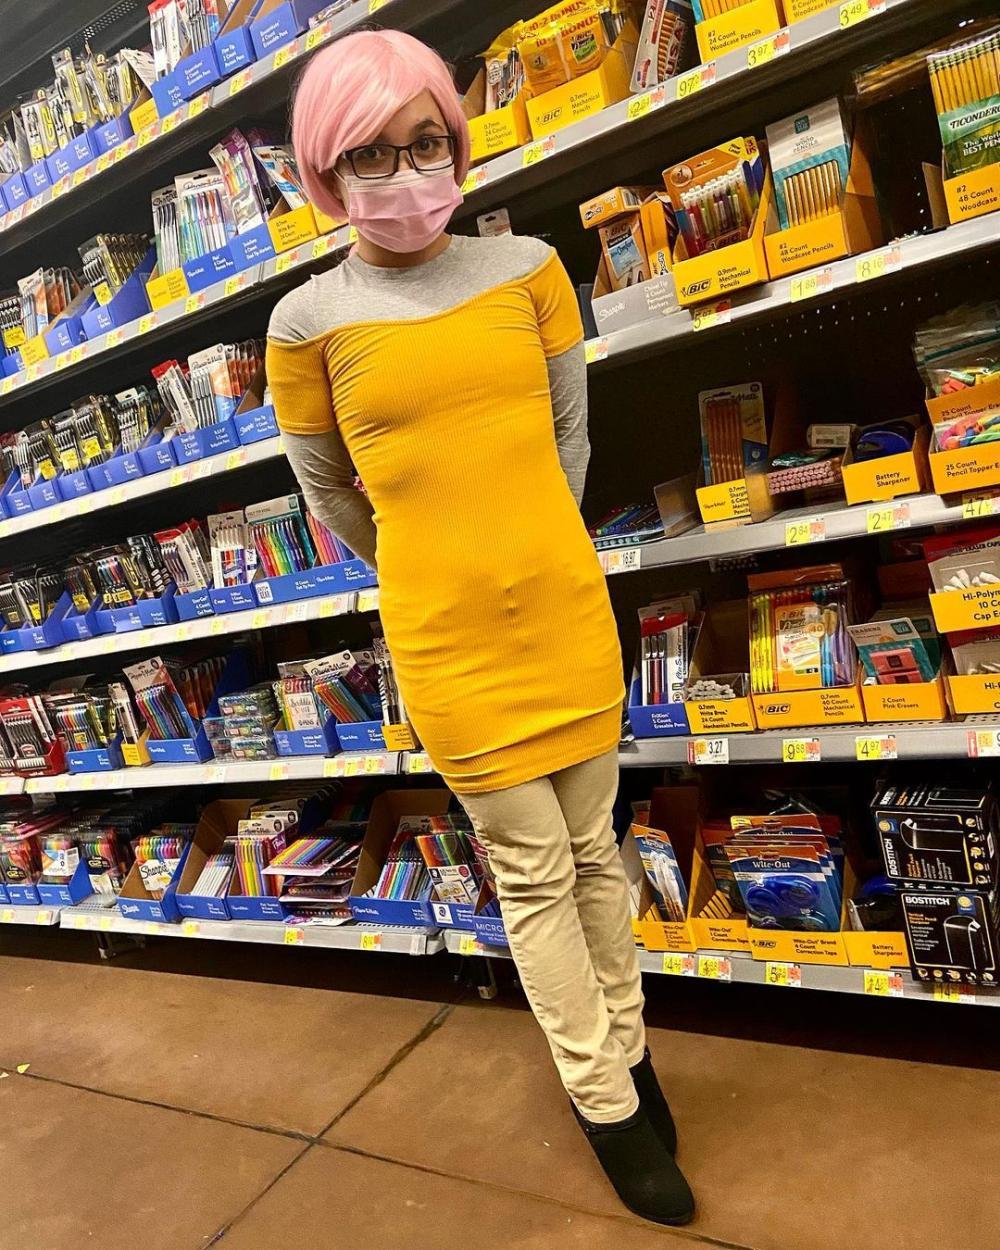 Pencil yellow costume